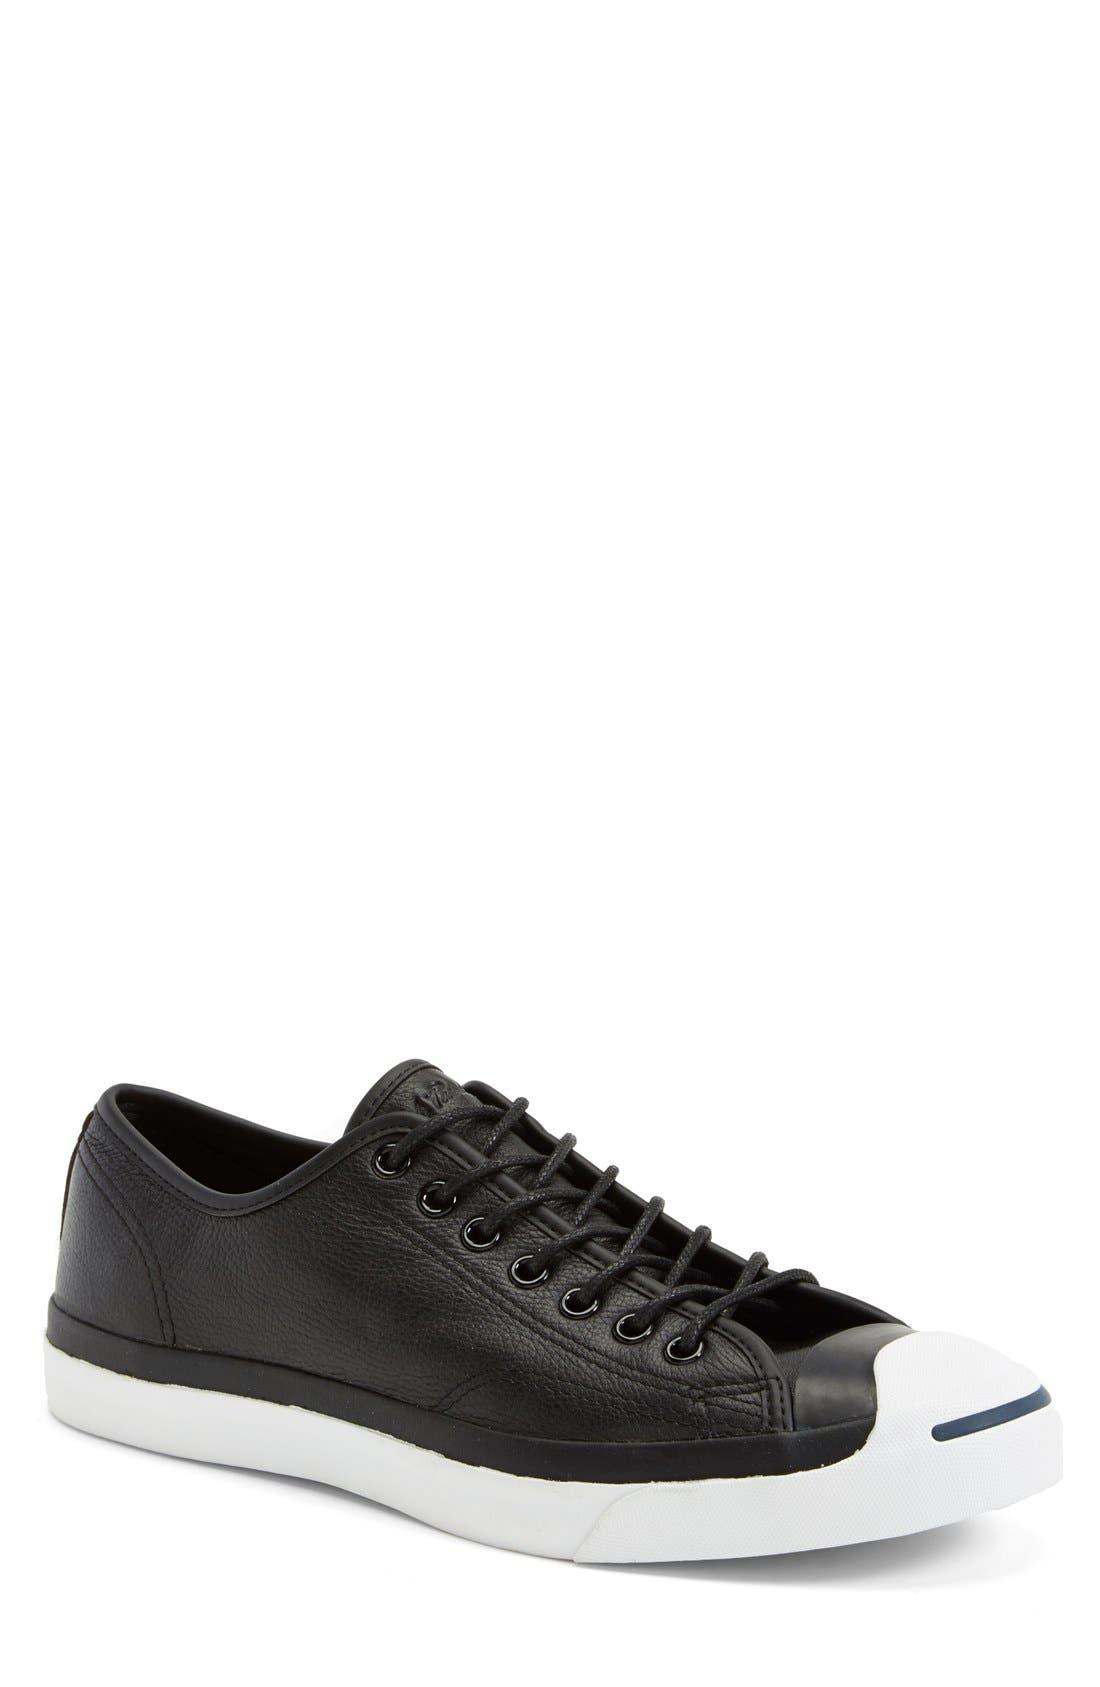 converse black and white. converse \u0027jack purcell - jack\u0027 sneaker black and white